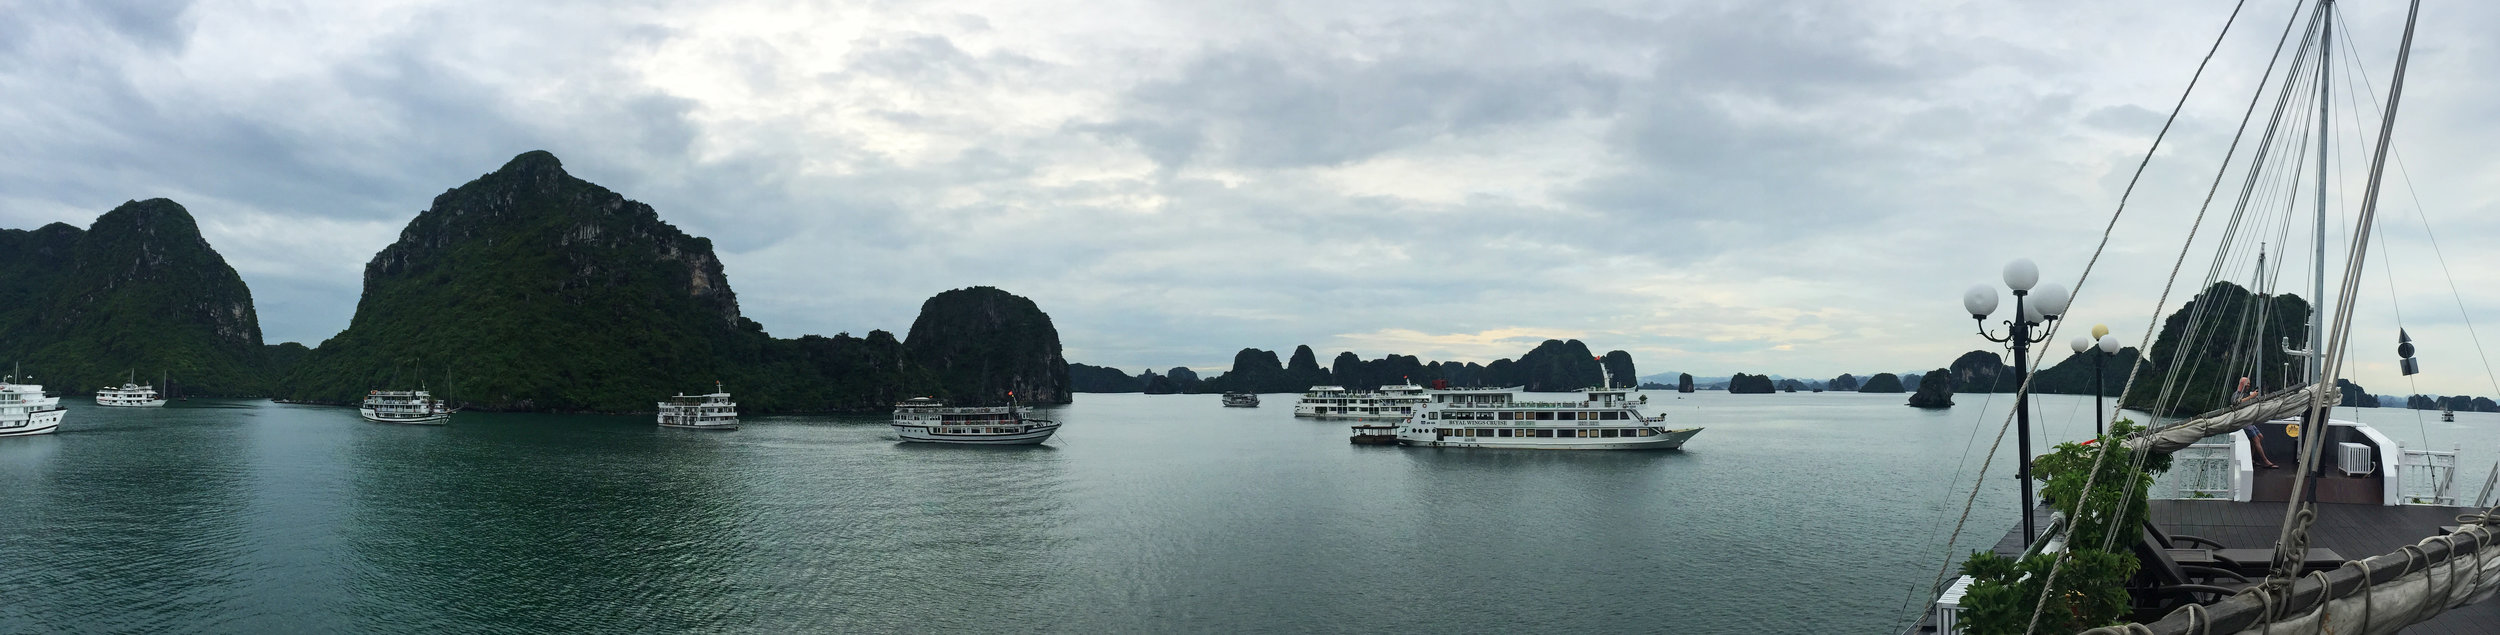 12_Vietnam_Halong03.jpg